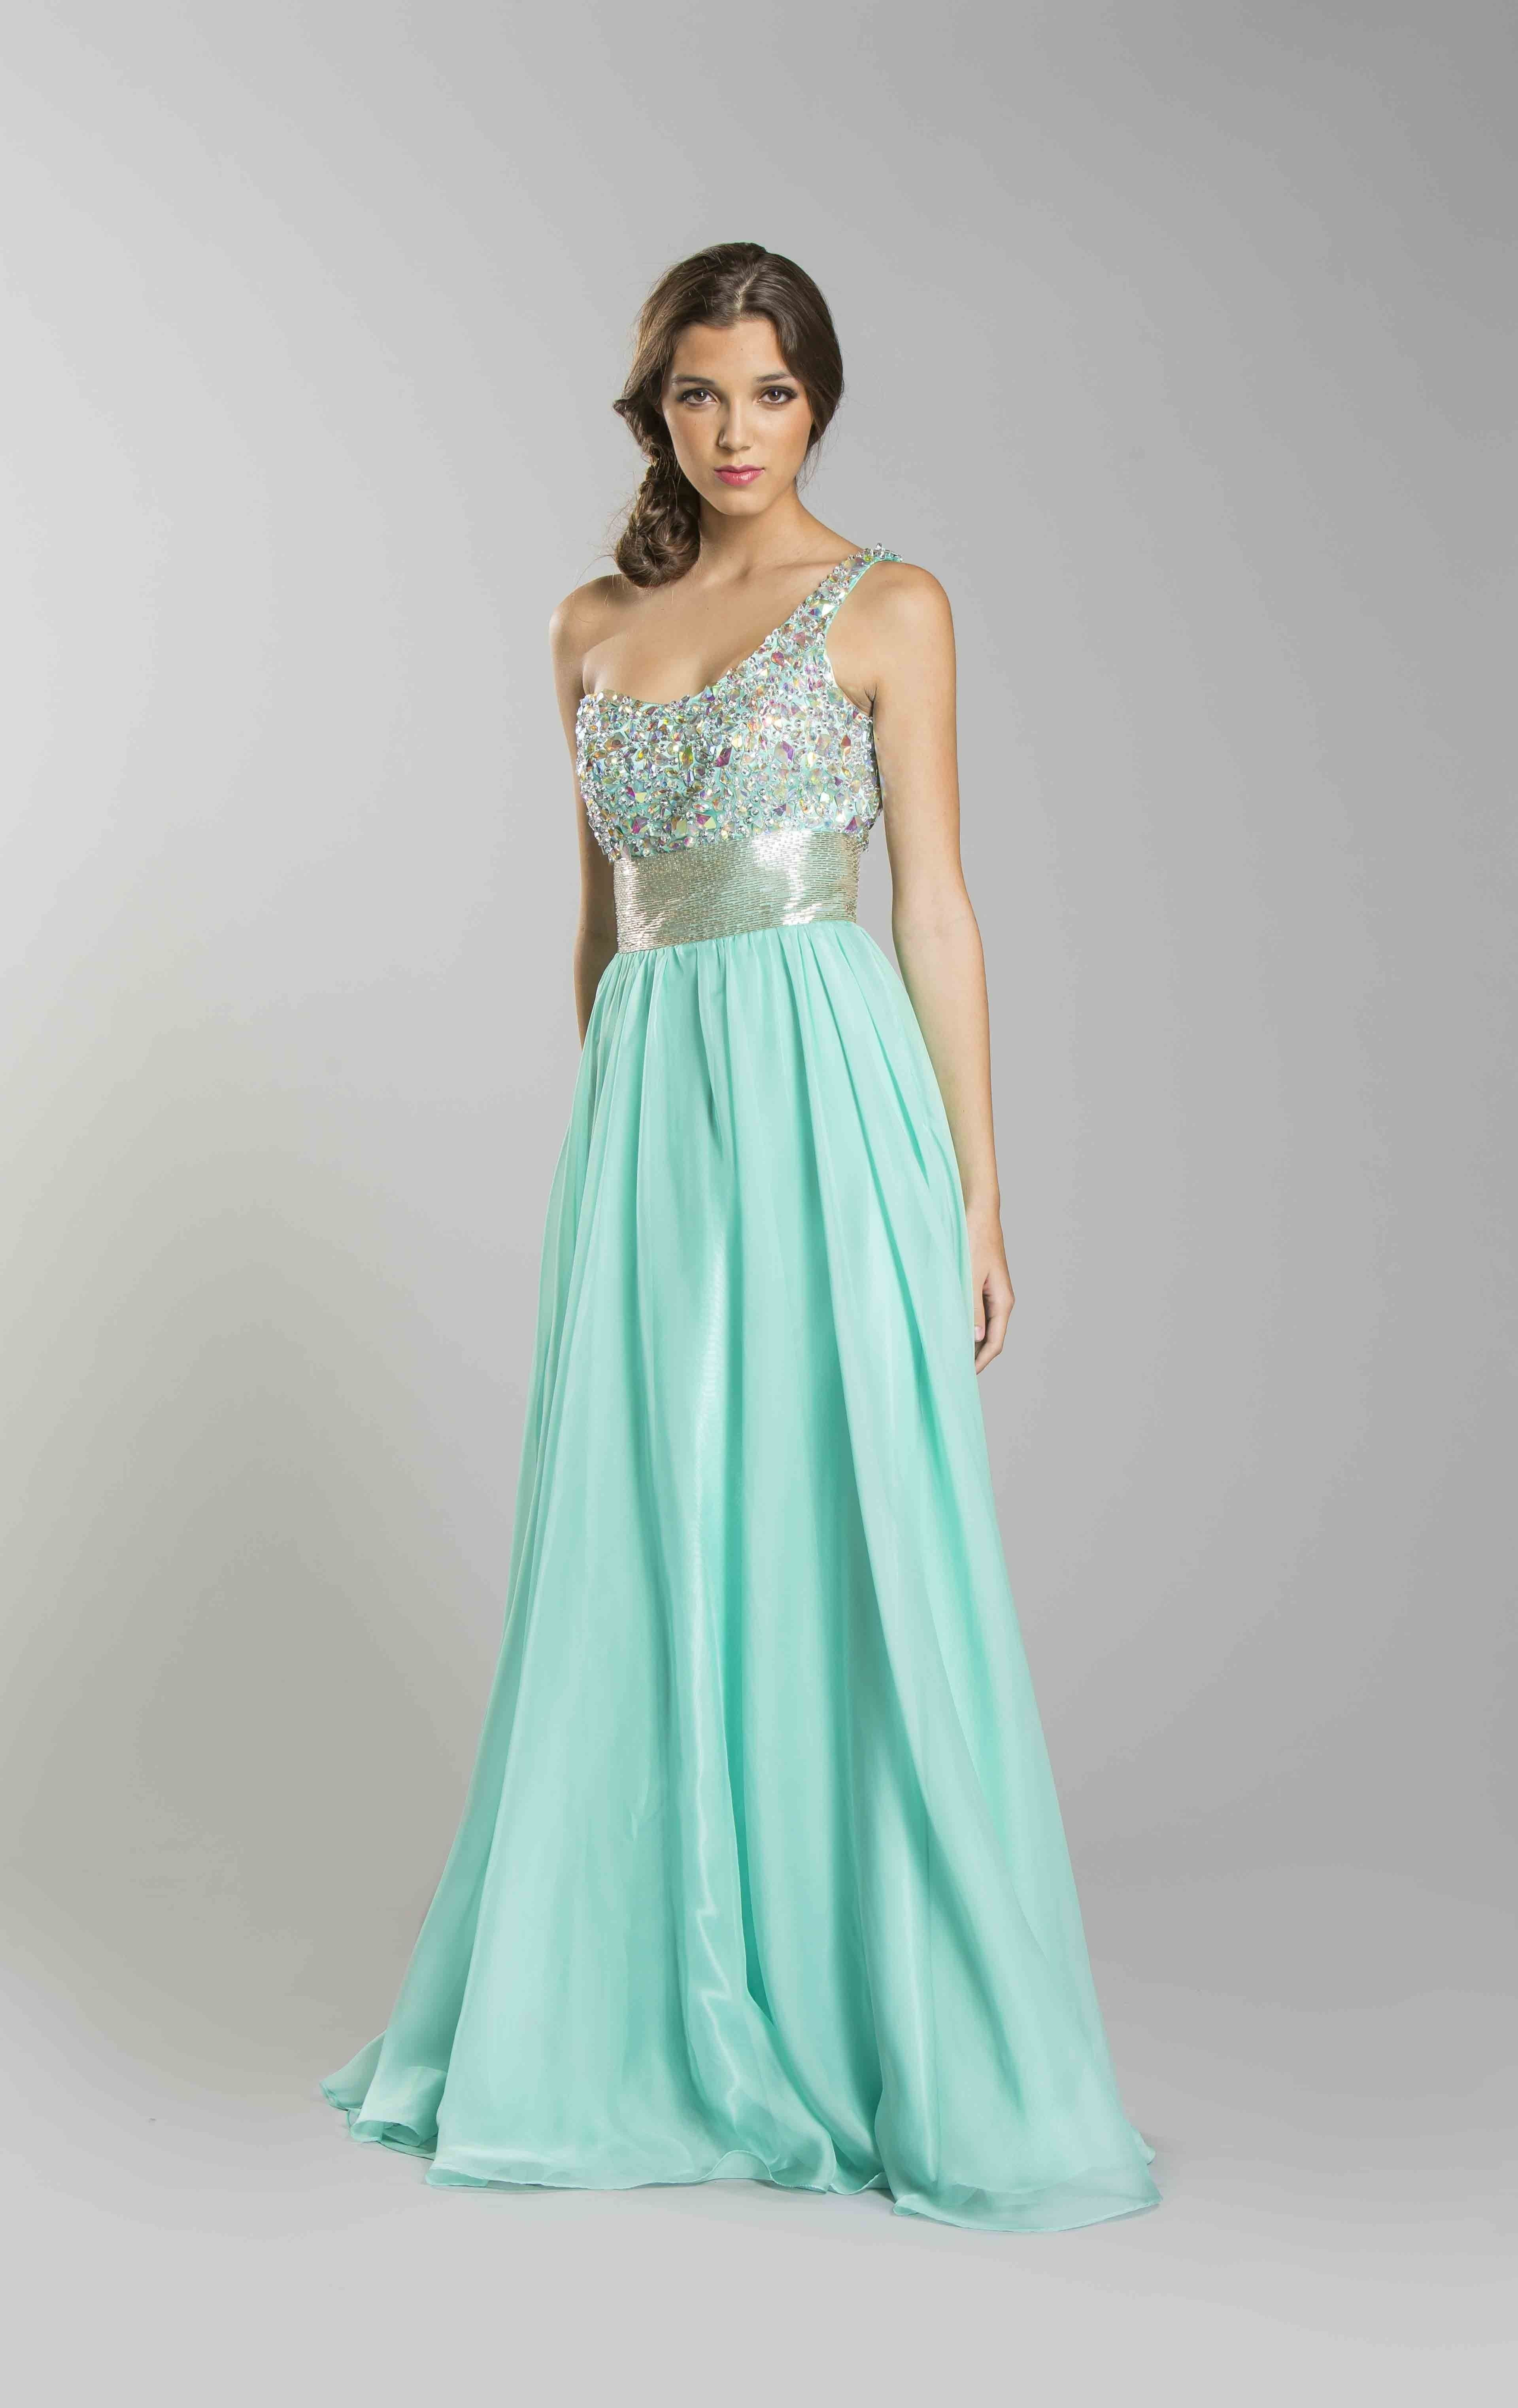 Long prom dress for short girl - Style Jeans